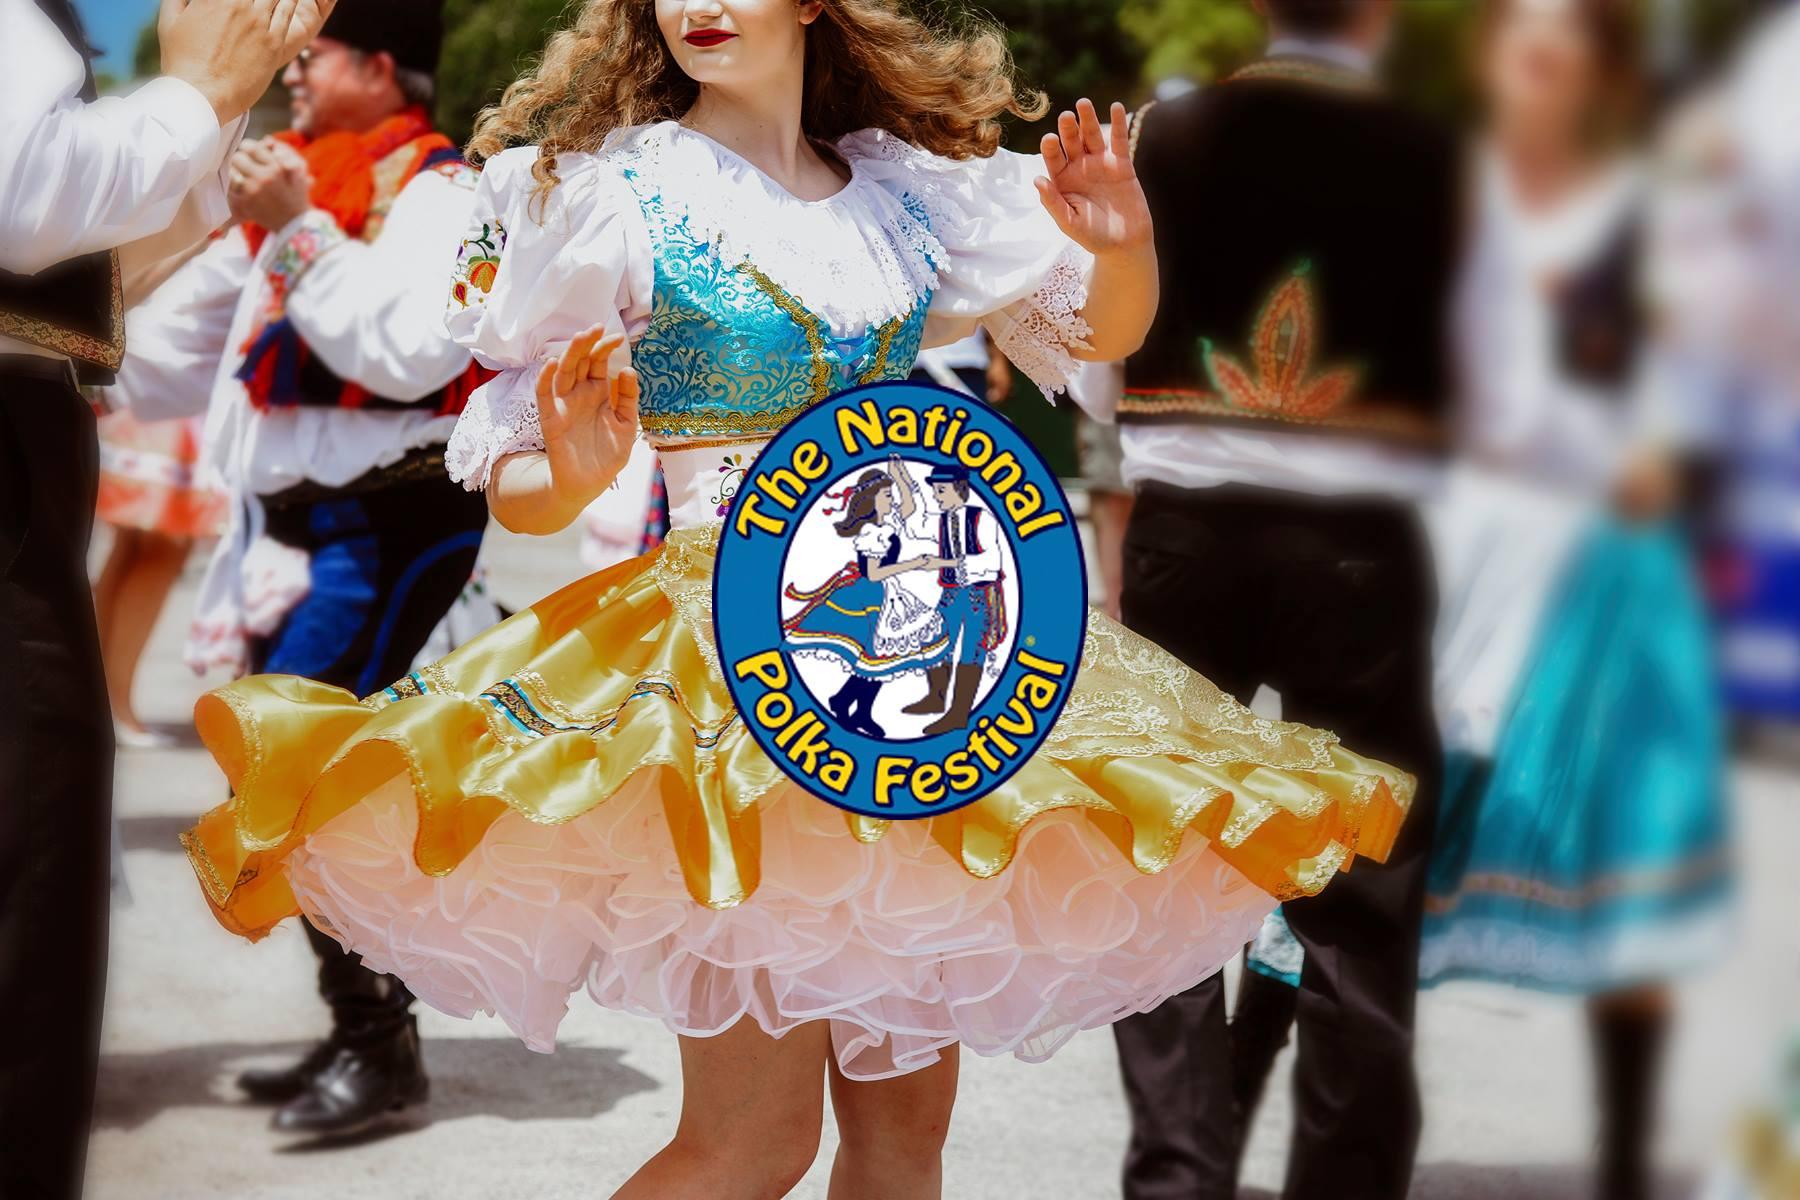 National Polka Festival Texas 2022